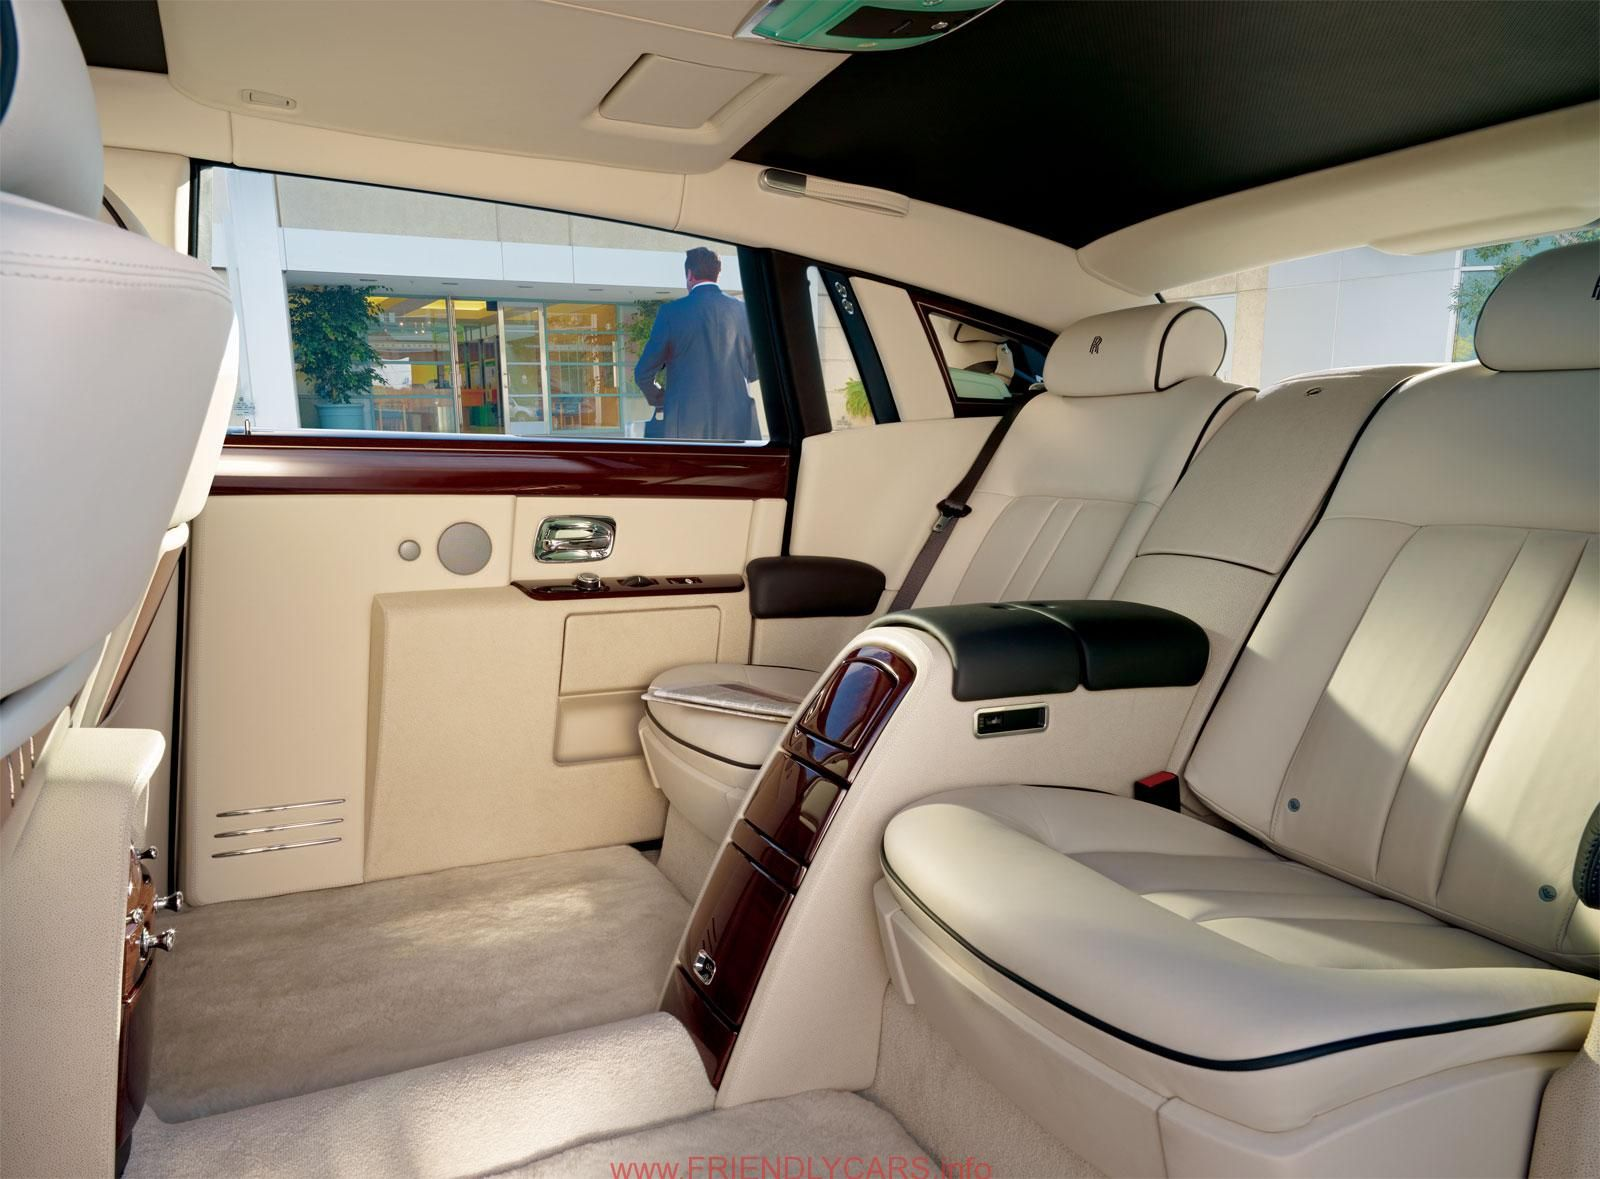 Cool Rolls Royce Ghost 2014 Price Car Images Hd Rolls Royce Ghost